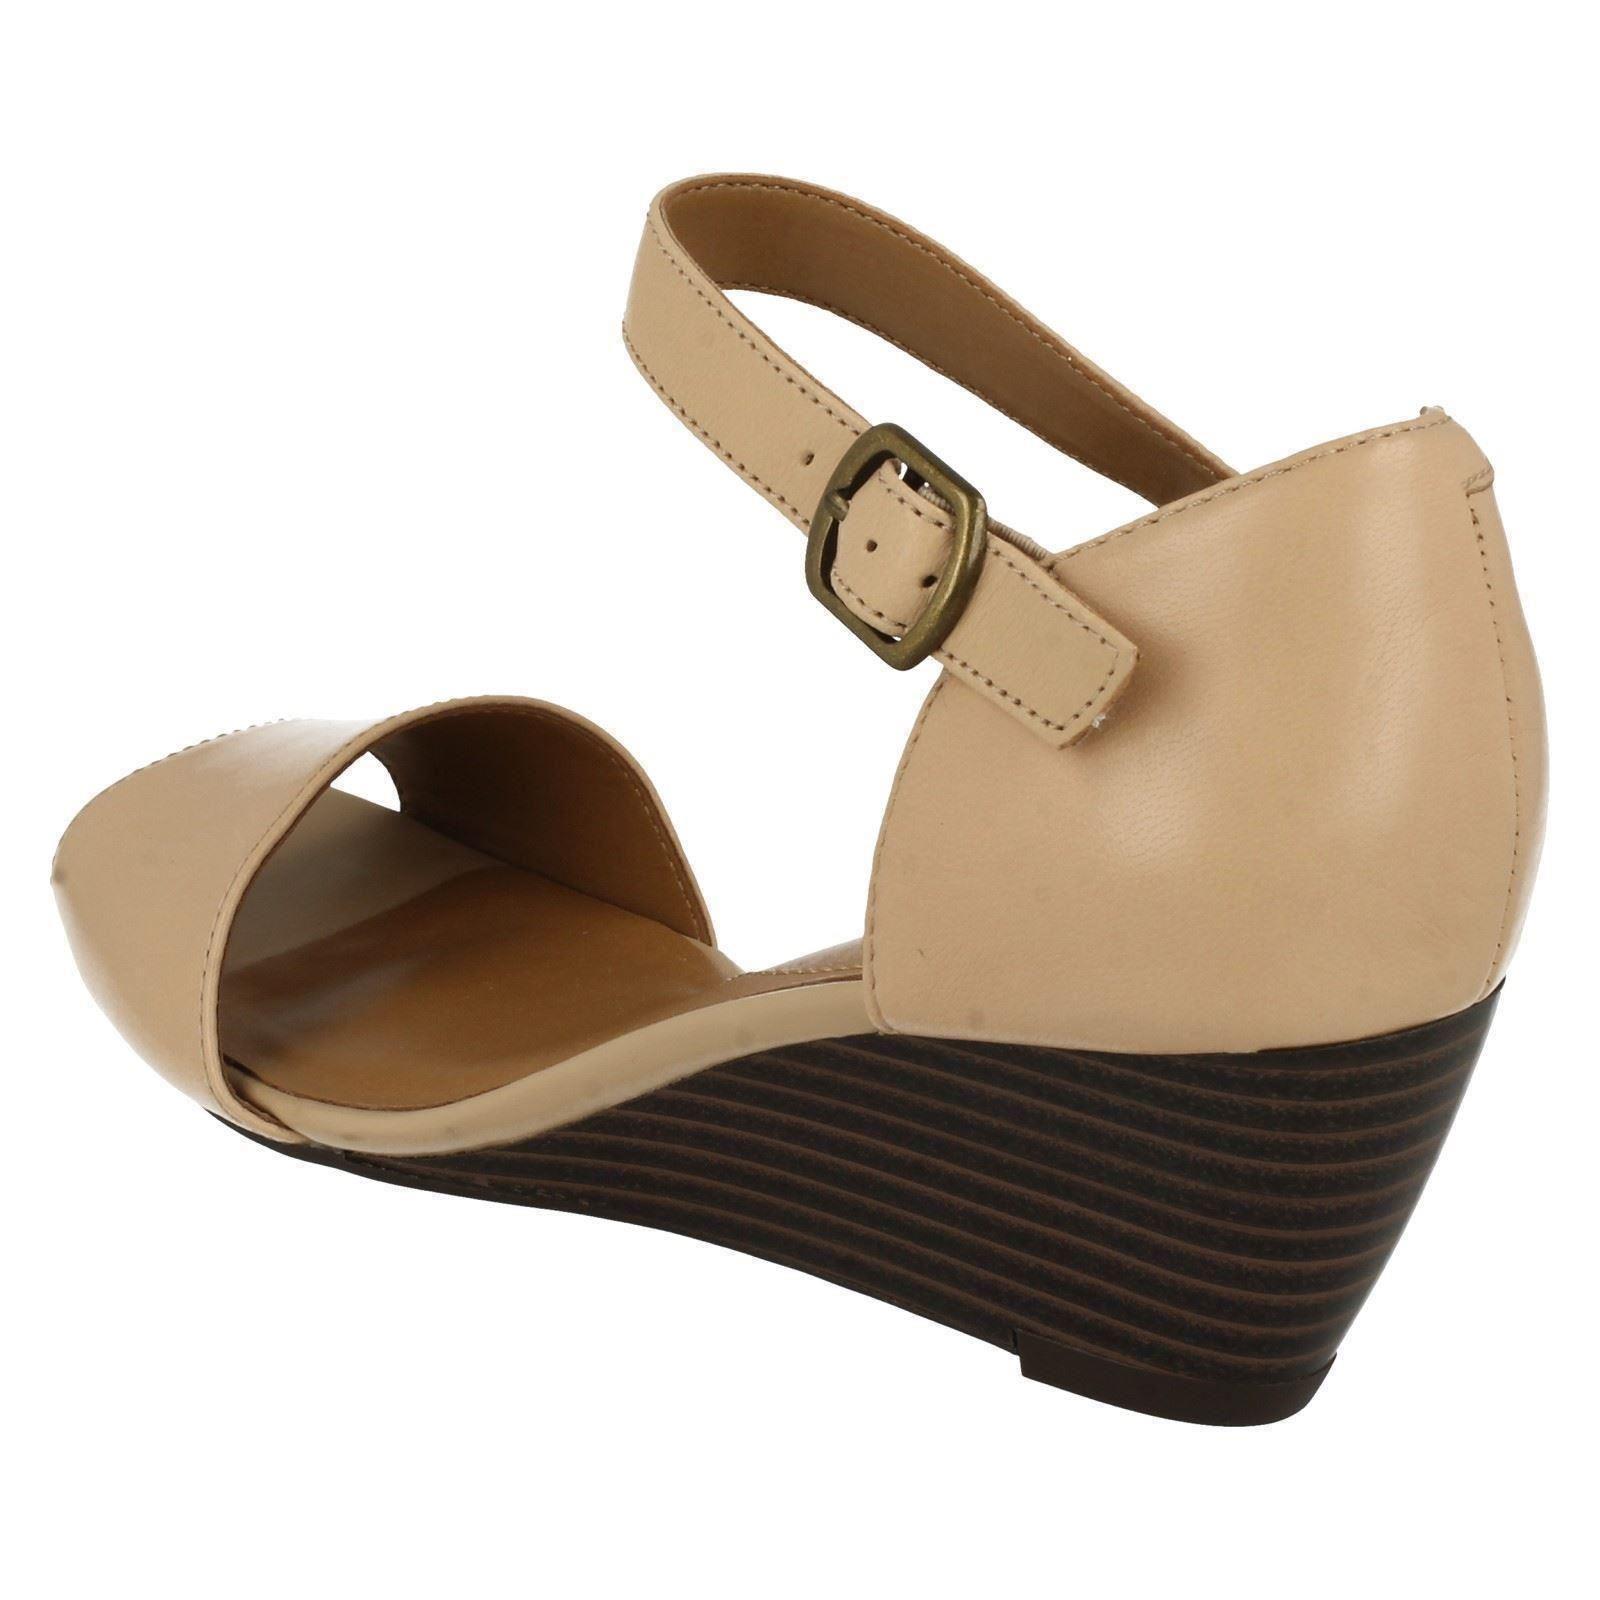 clarks smart wedge sandals brielle drive ebay